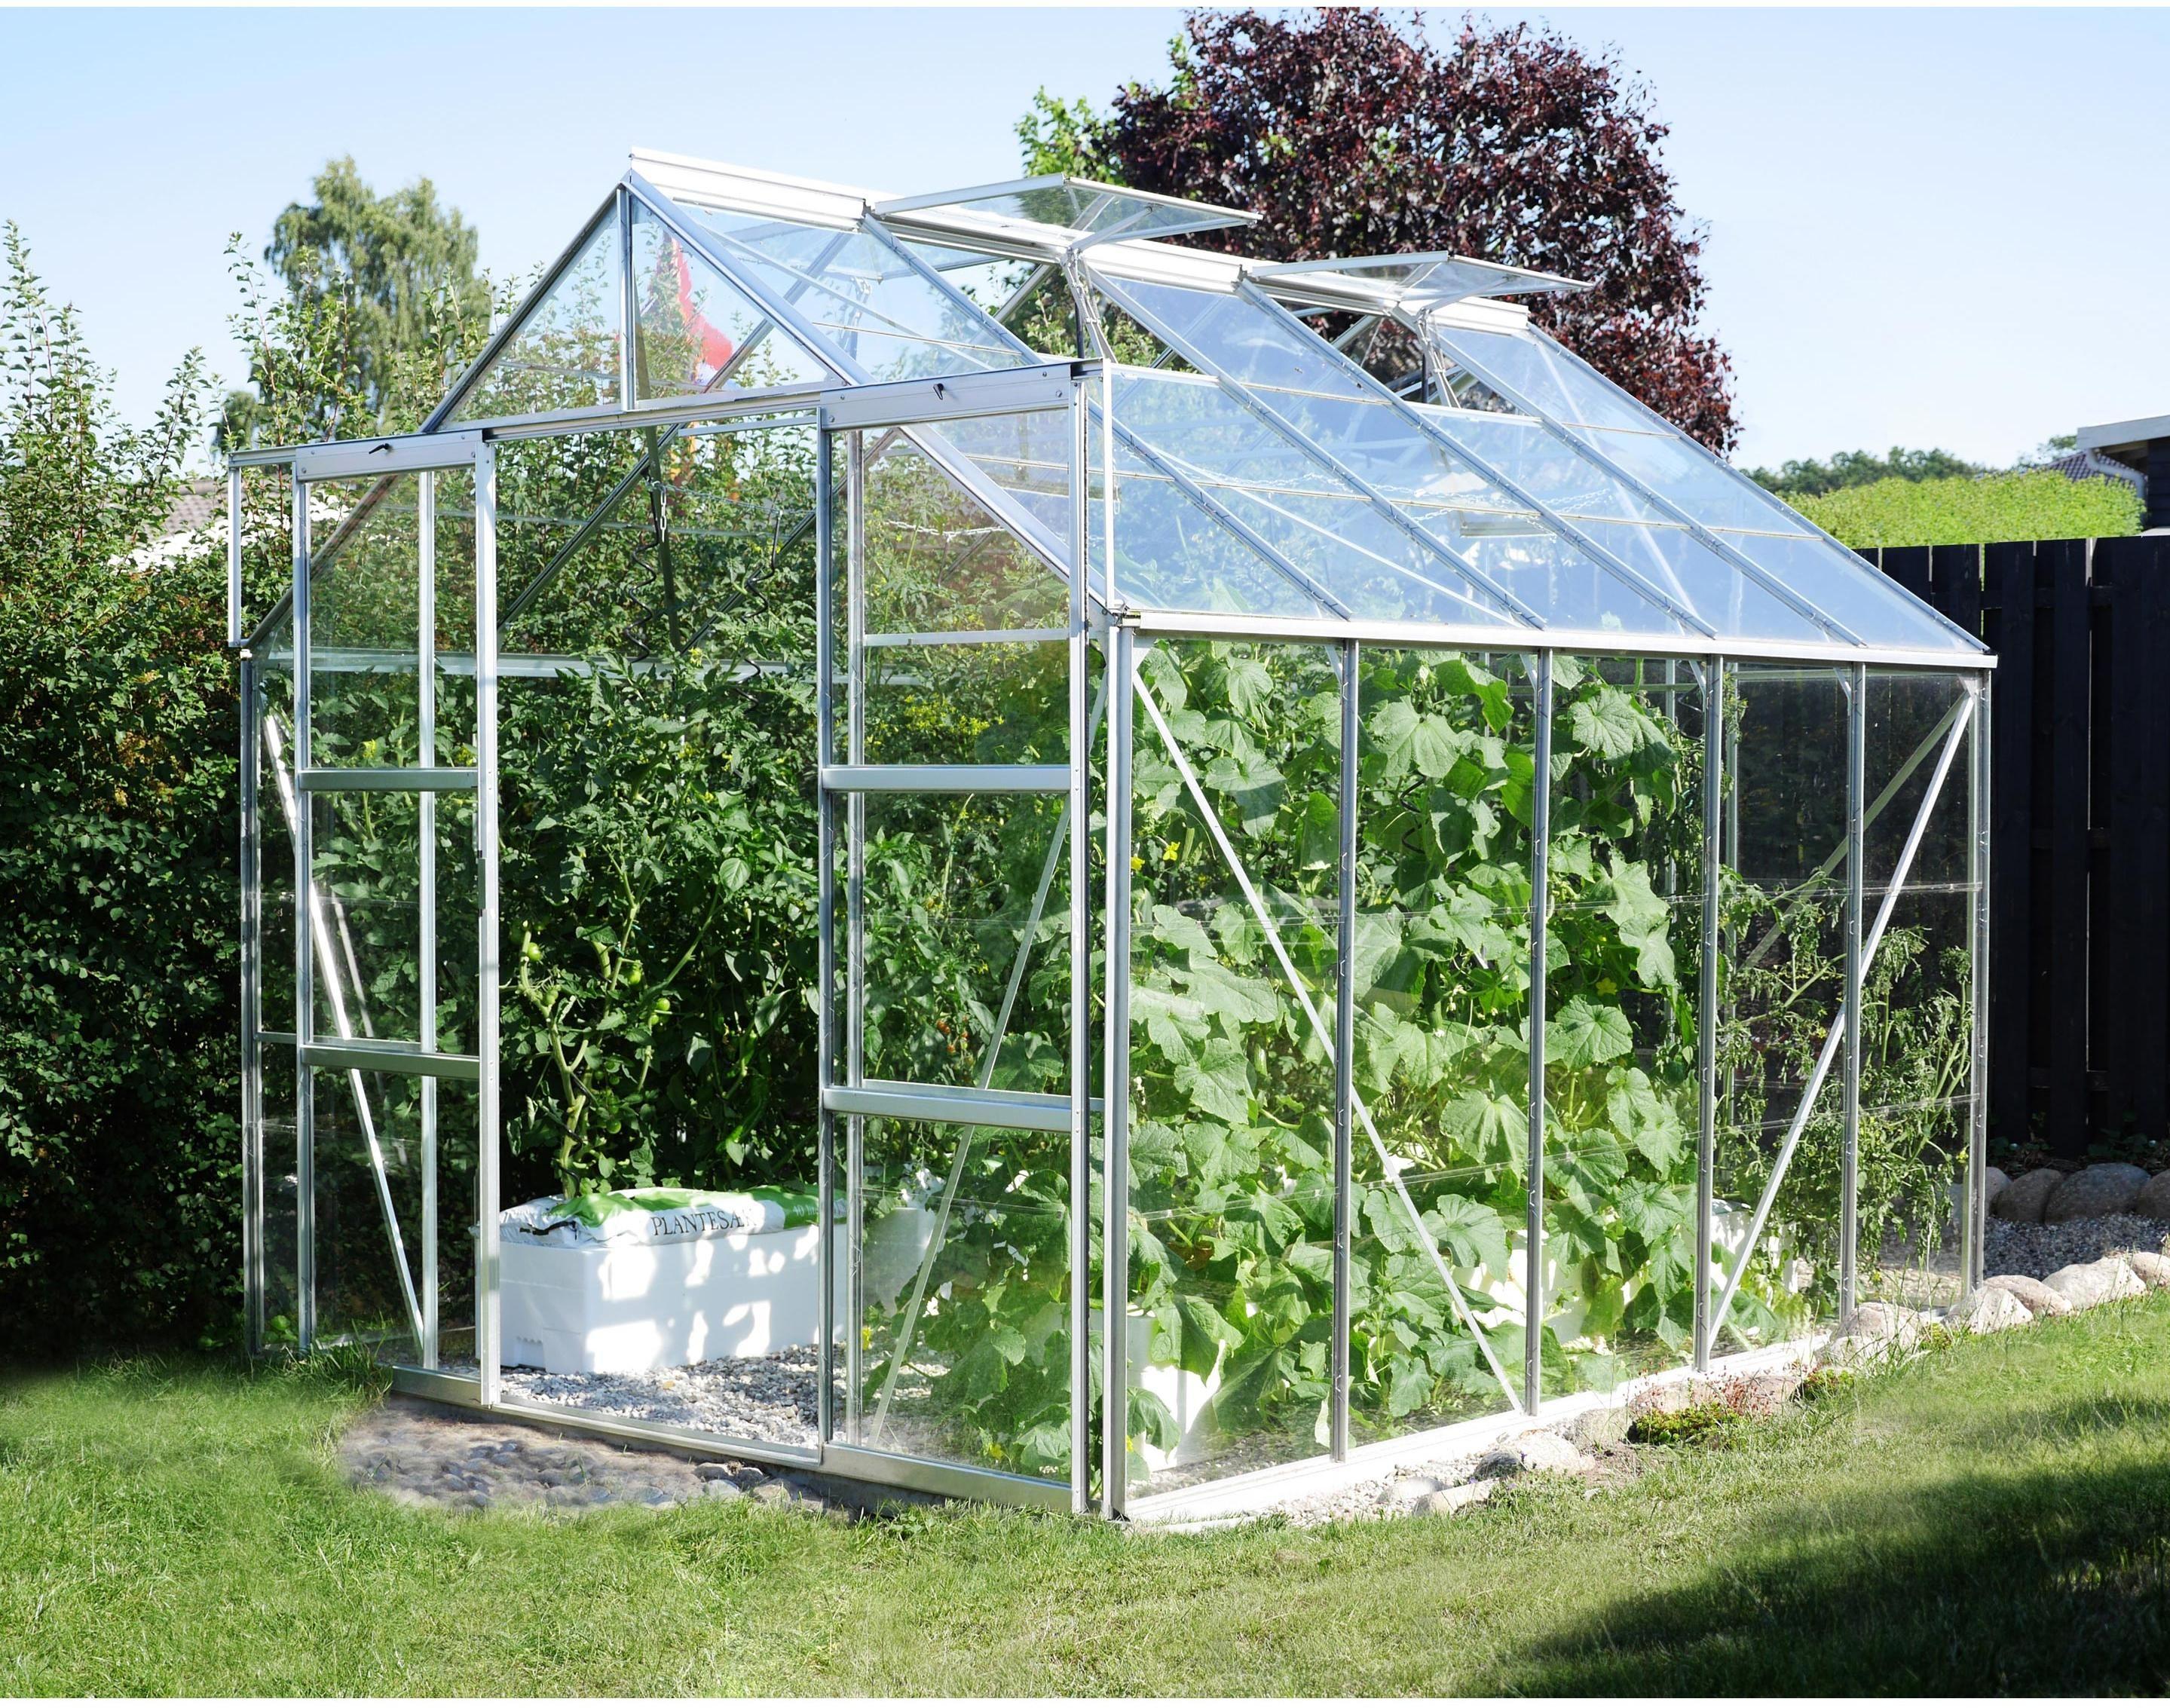 Serre De Jardin En Verre Trempe 3 Mm Lams Laurus Uranus 8300 Alu 8 25 M Lams En 2020 Serre Jardin Maison Verte Et Jardins